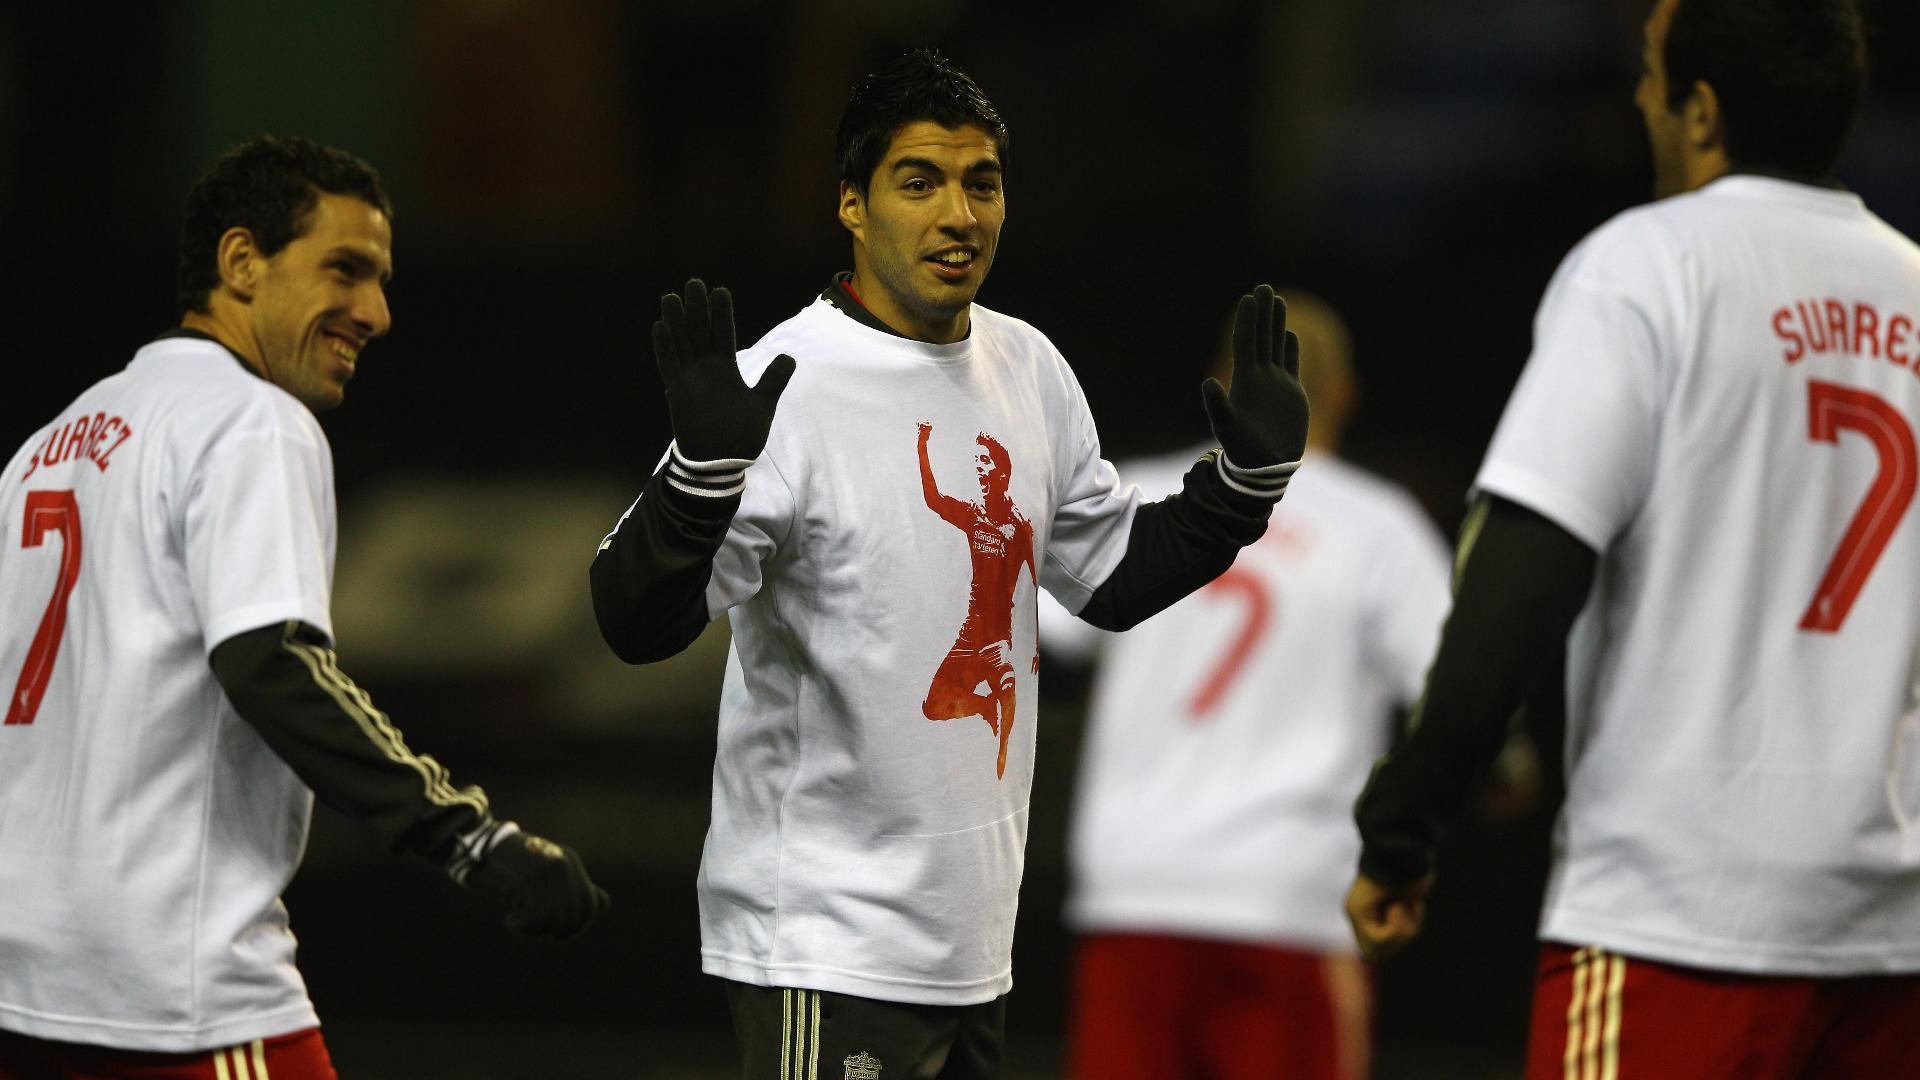 Suarez t-shirt Liverpool